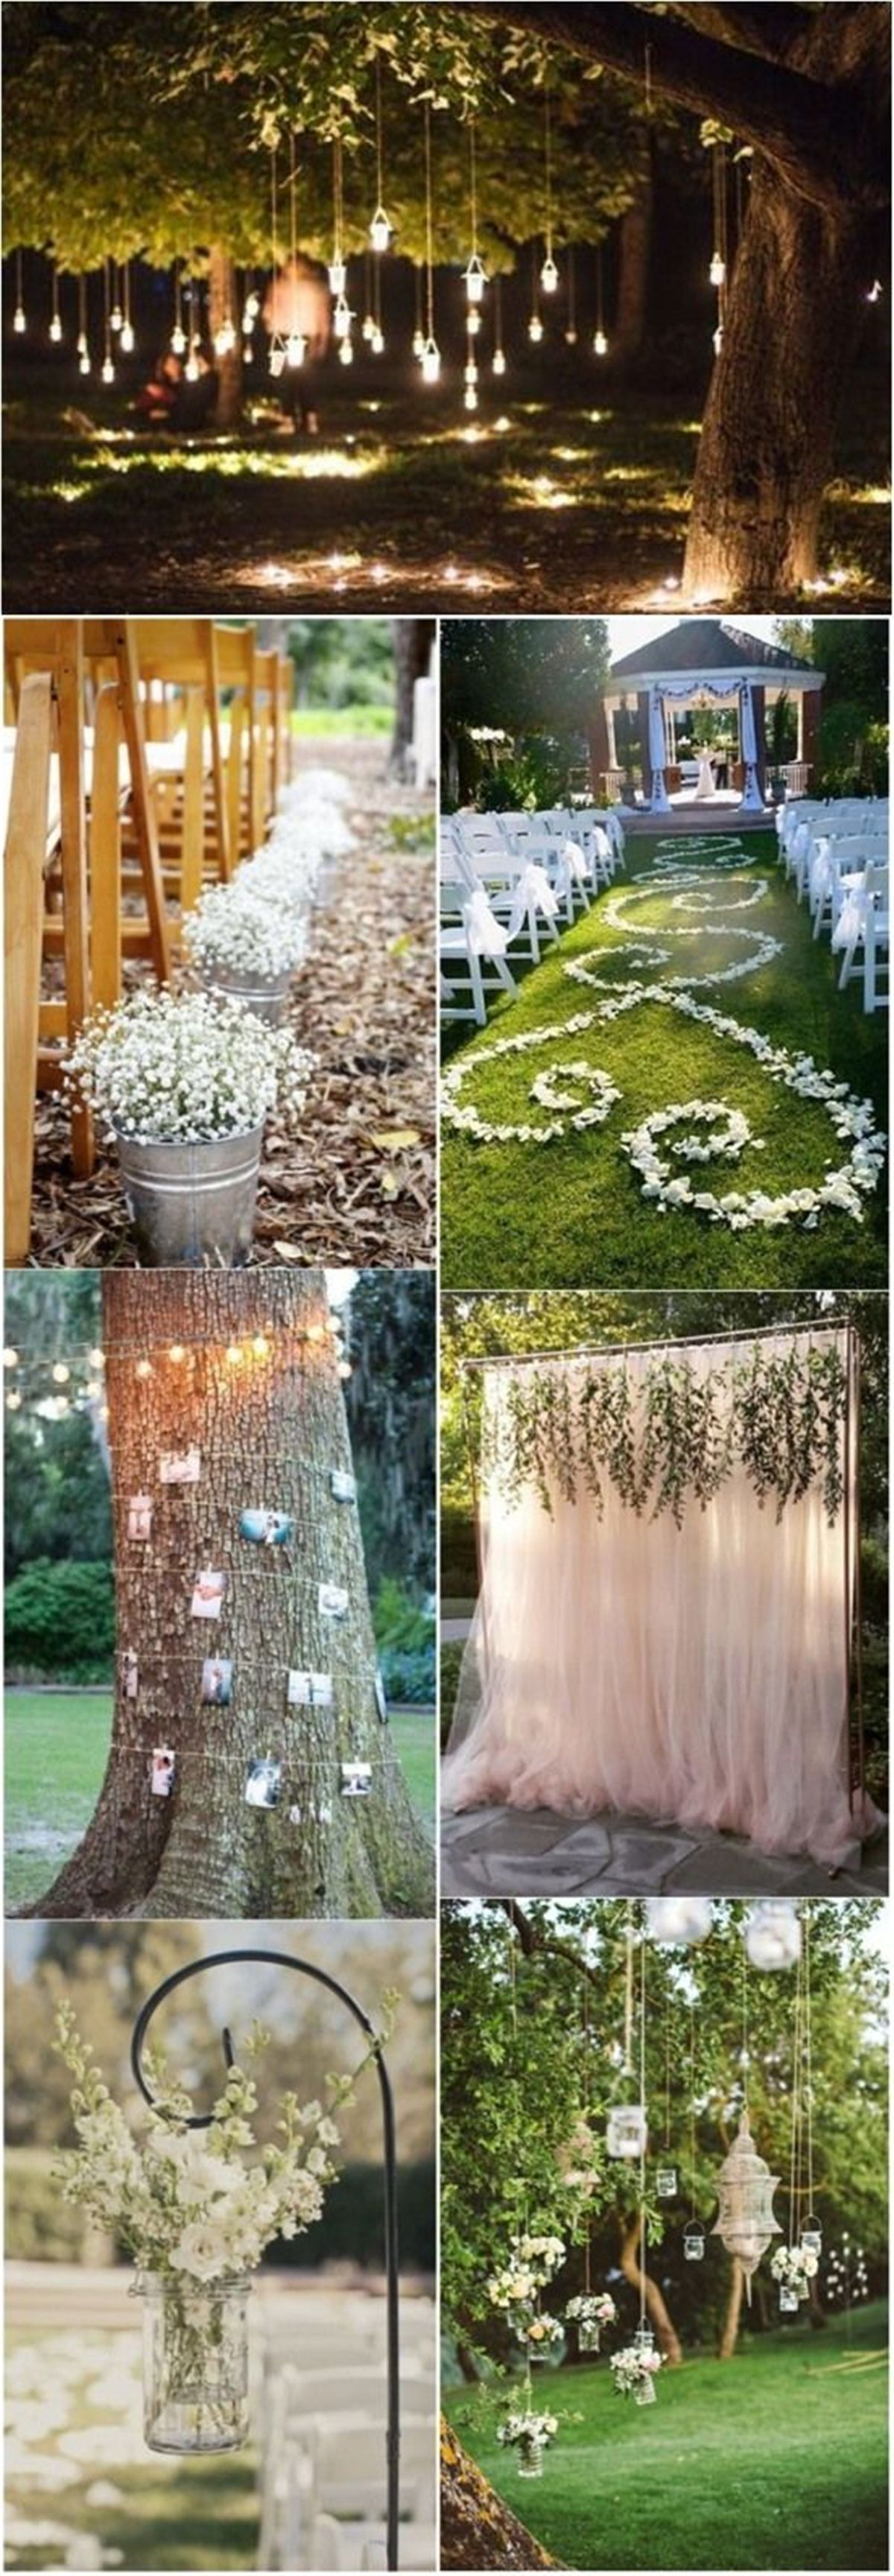 outside wedding lighting ideas. 20+ Genius Outdoor Wedding Ideas Outside Lighting T